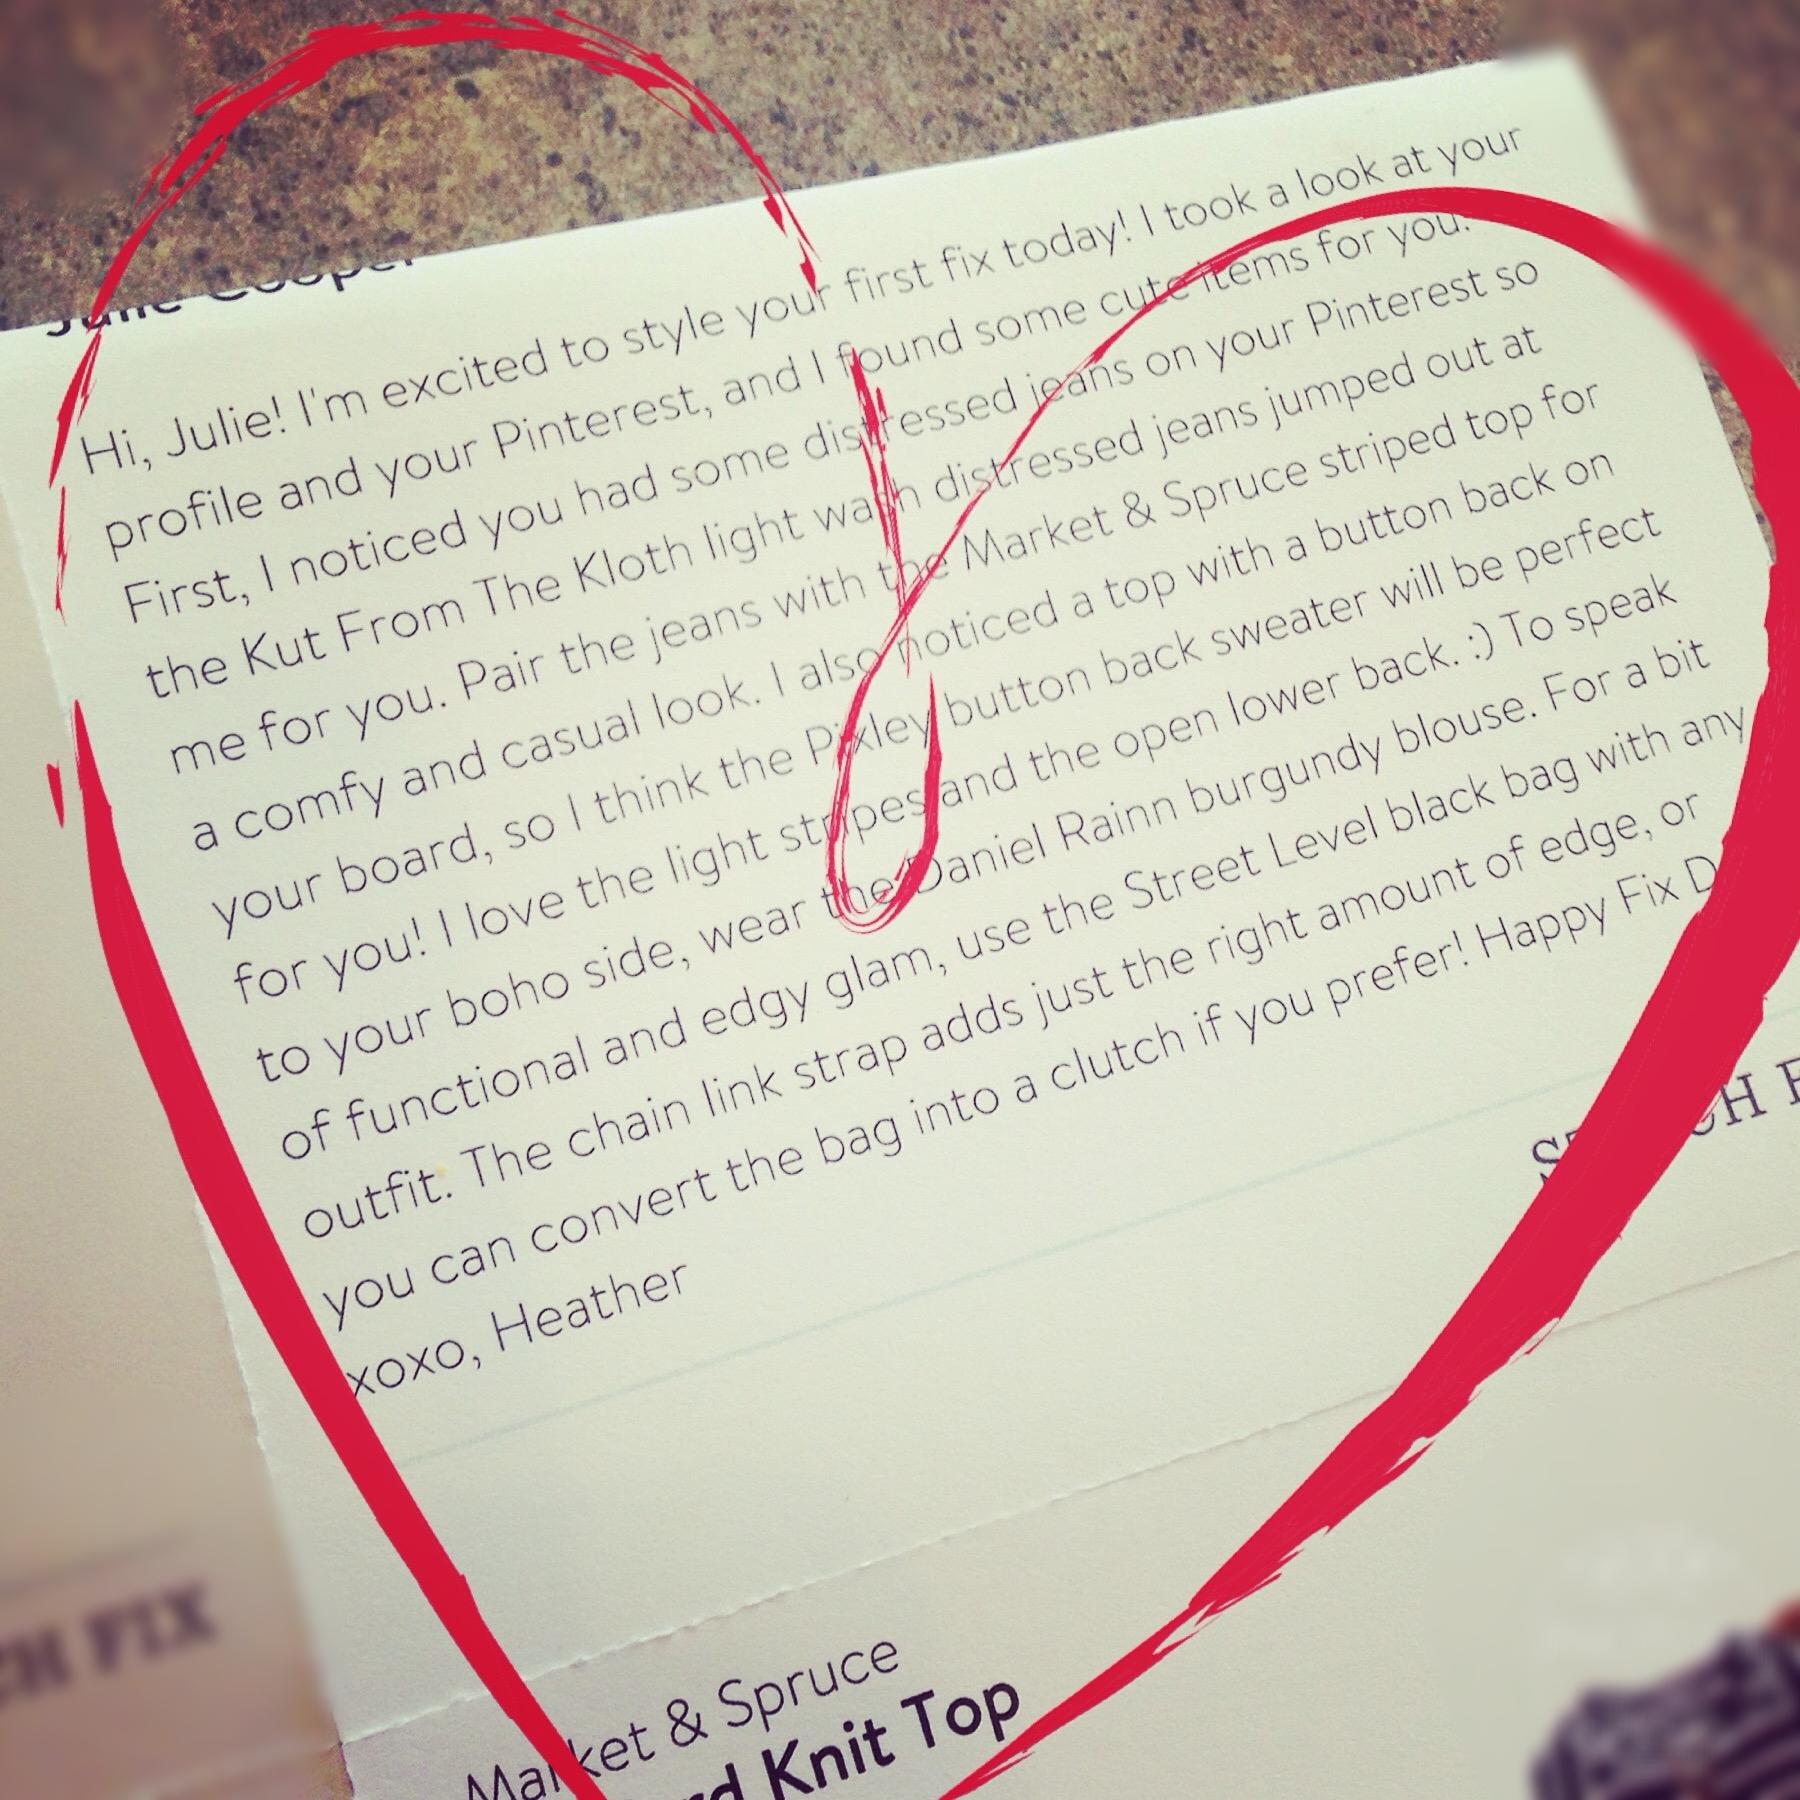 Love note from my Stitch Fix stylist #virtualbesties